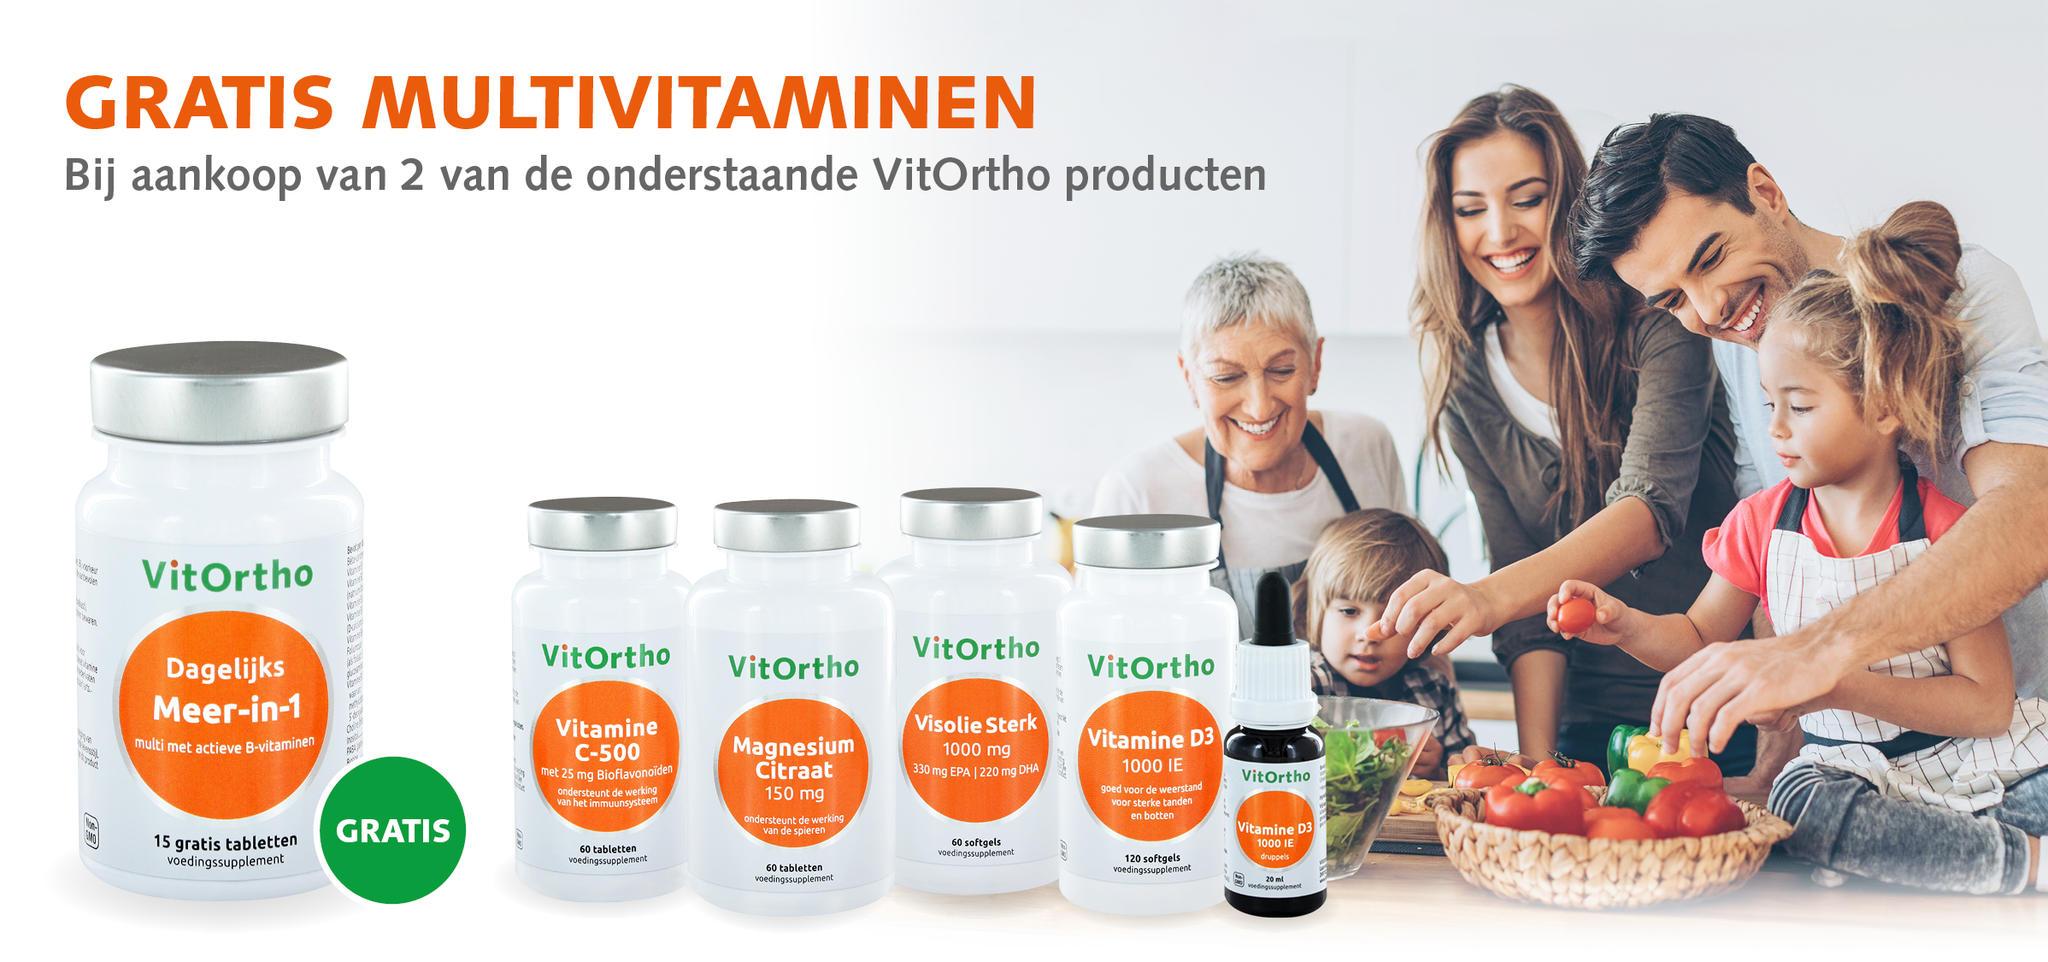 Actie VitOrtho Gratis Multivitamine